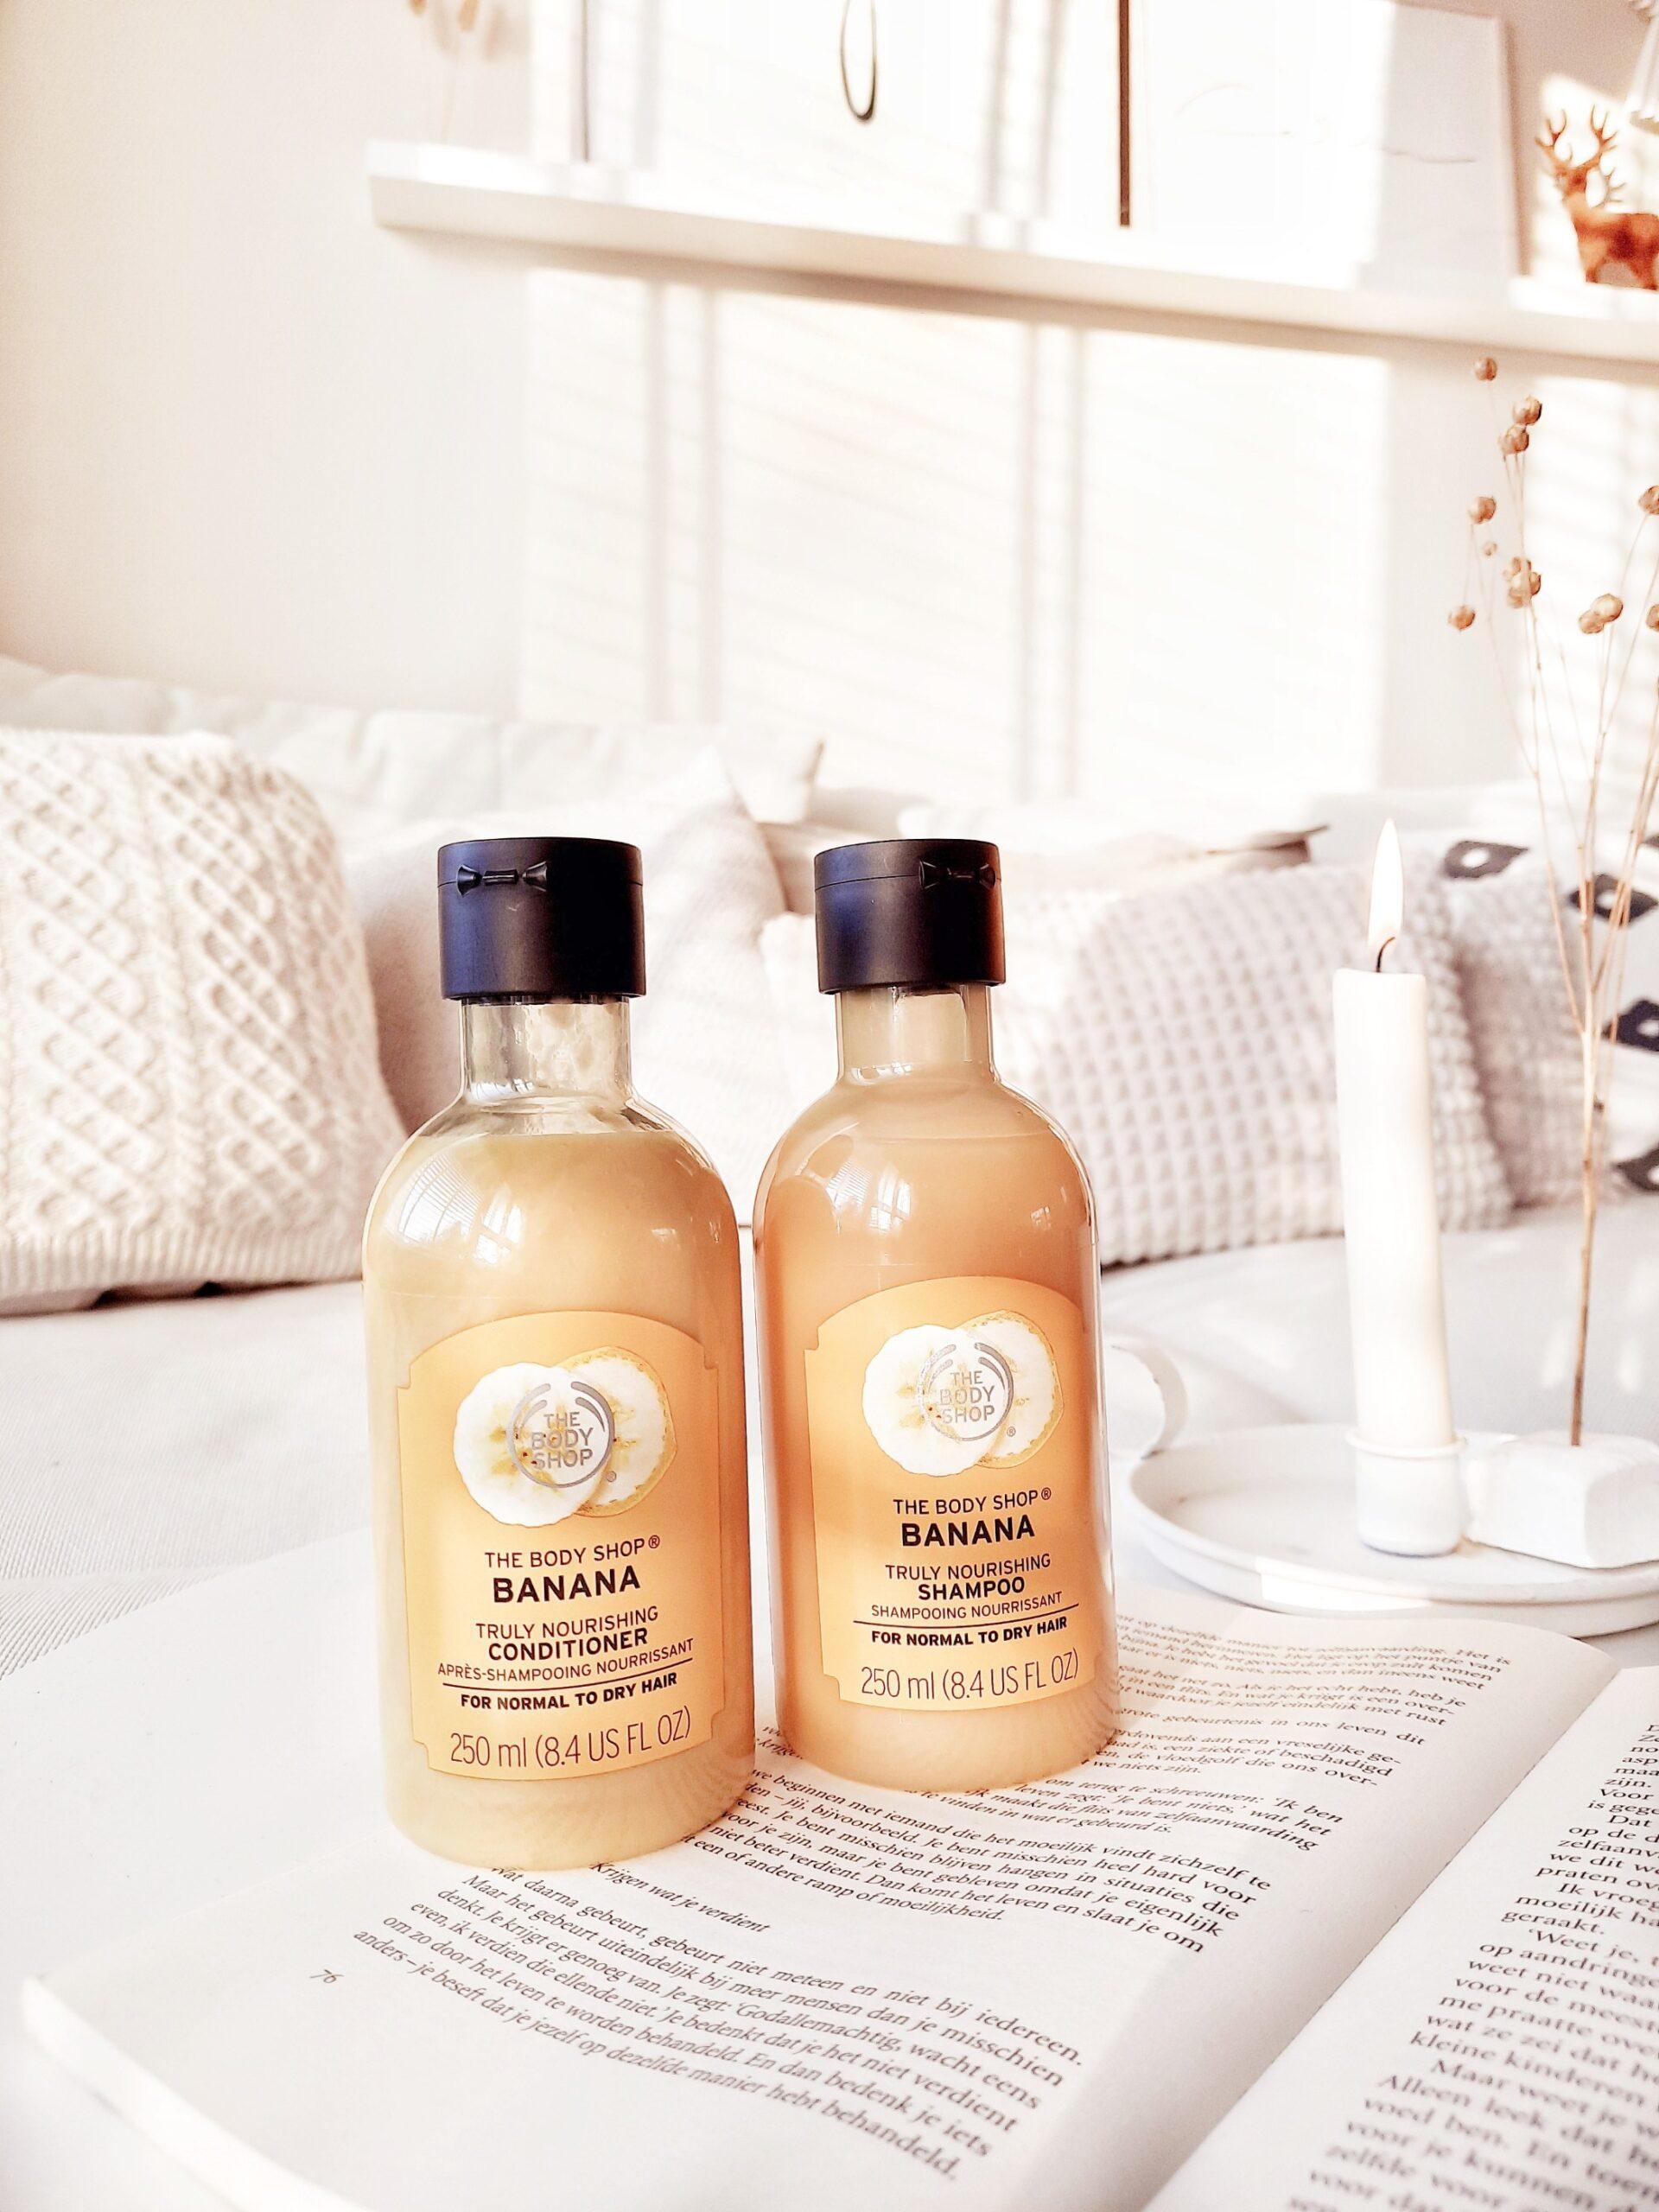 The Body Shop Banana Truly Nourishing Shampoo & Conditioner